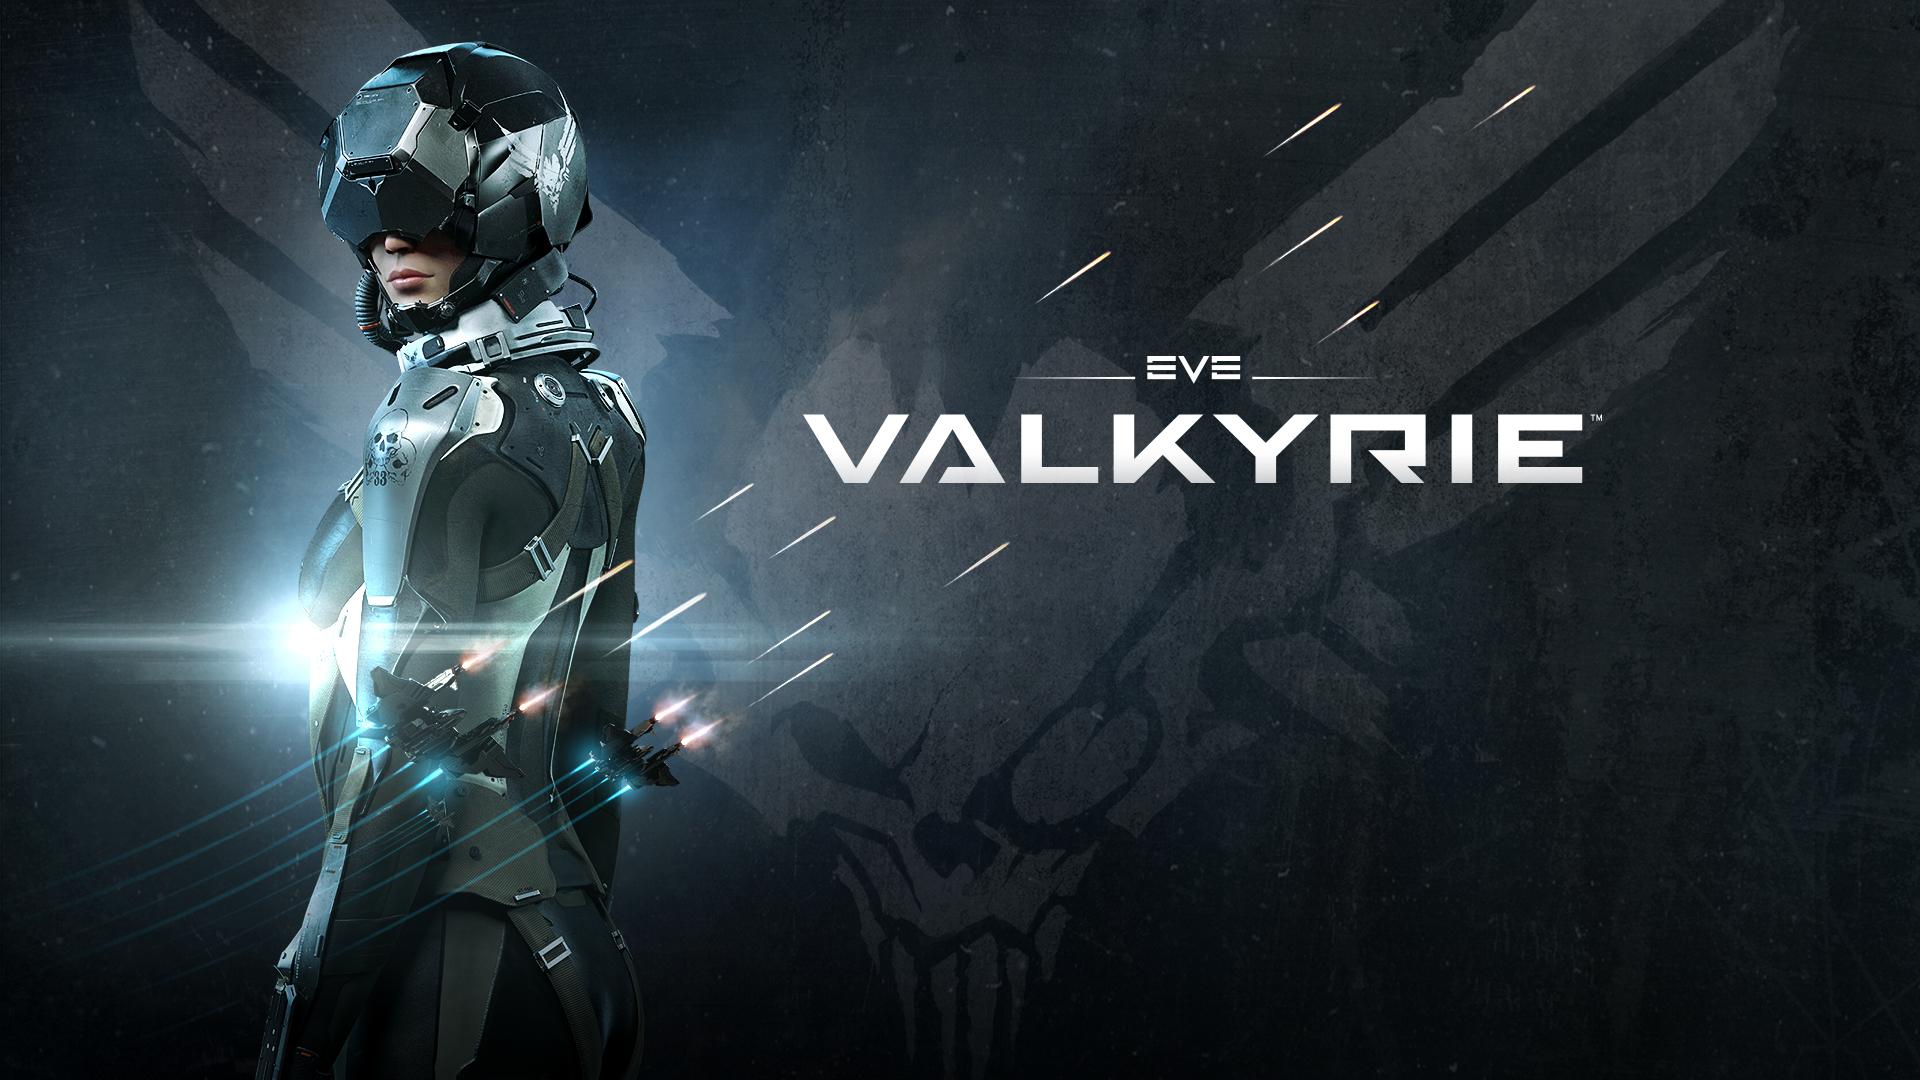 Создатели LittleBigPlanet 3 приобрели разработчика EVE: Valkyrie